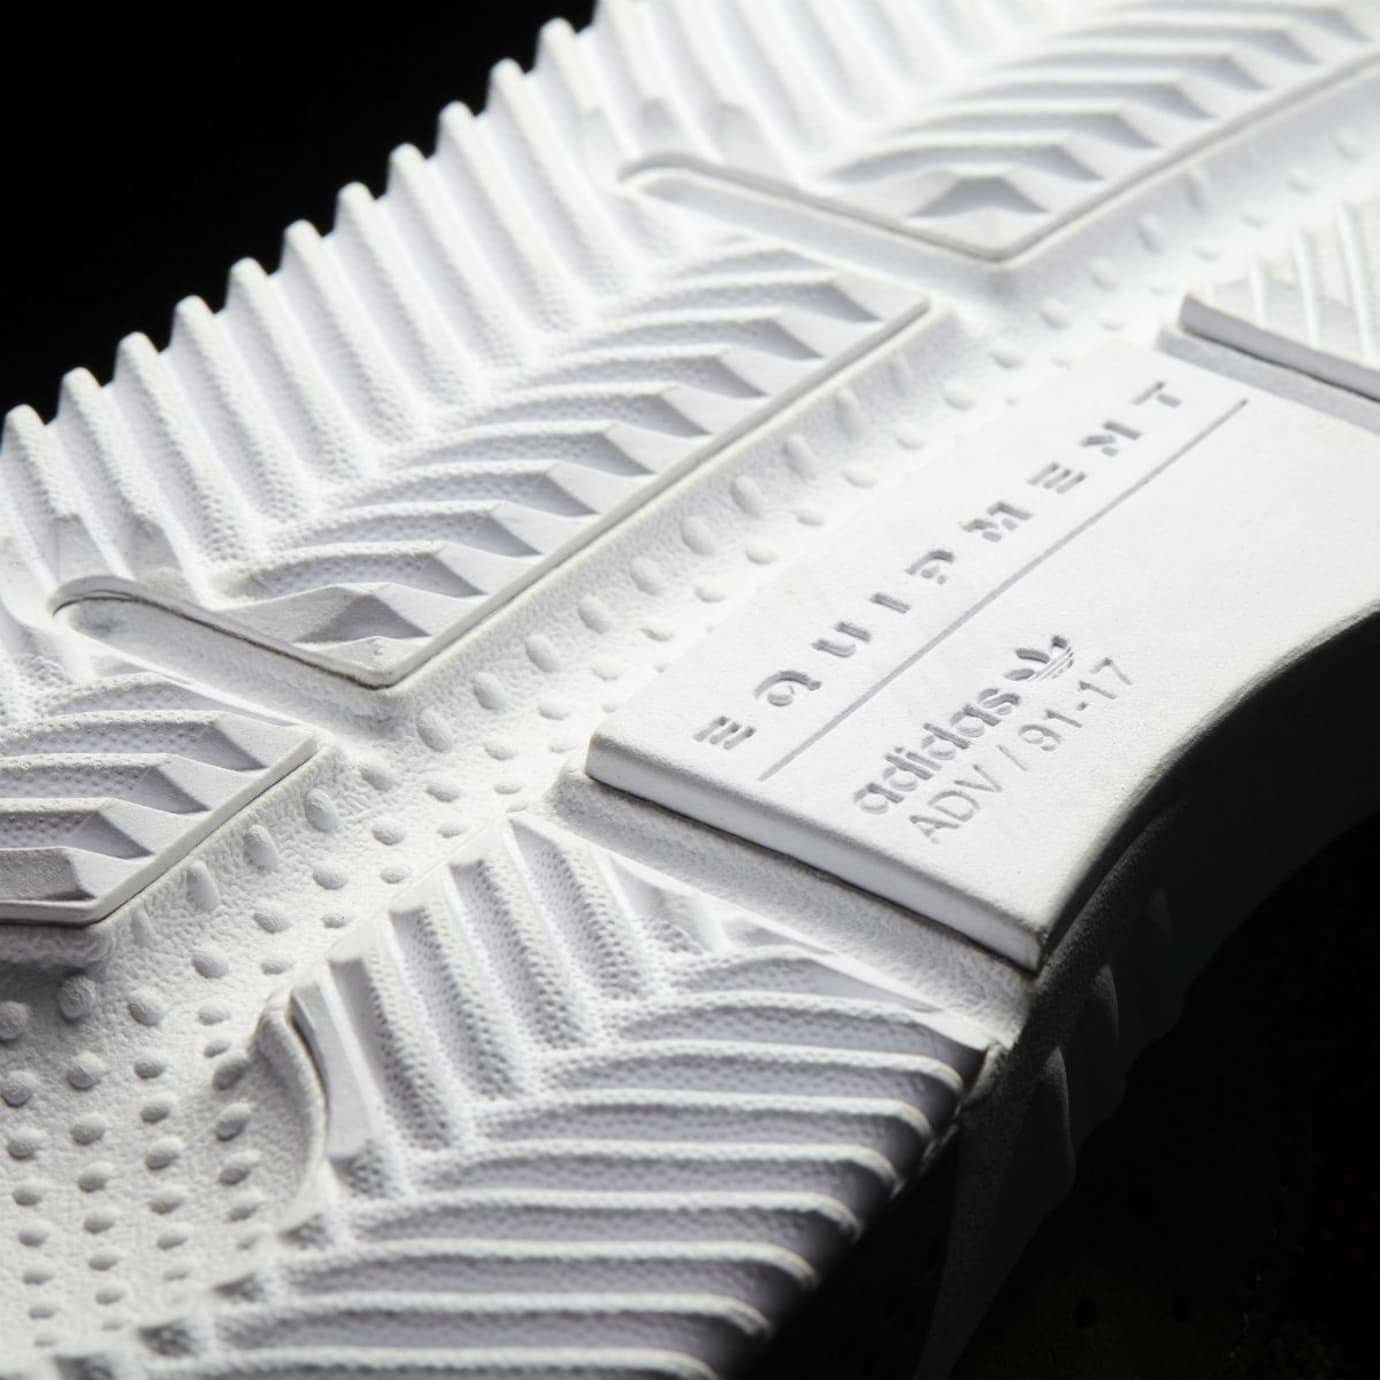 online retailer c2afa b212f Adidas EQT Cushion ADV Olive Camo Release Date AC7722 Outsole